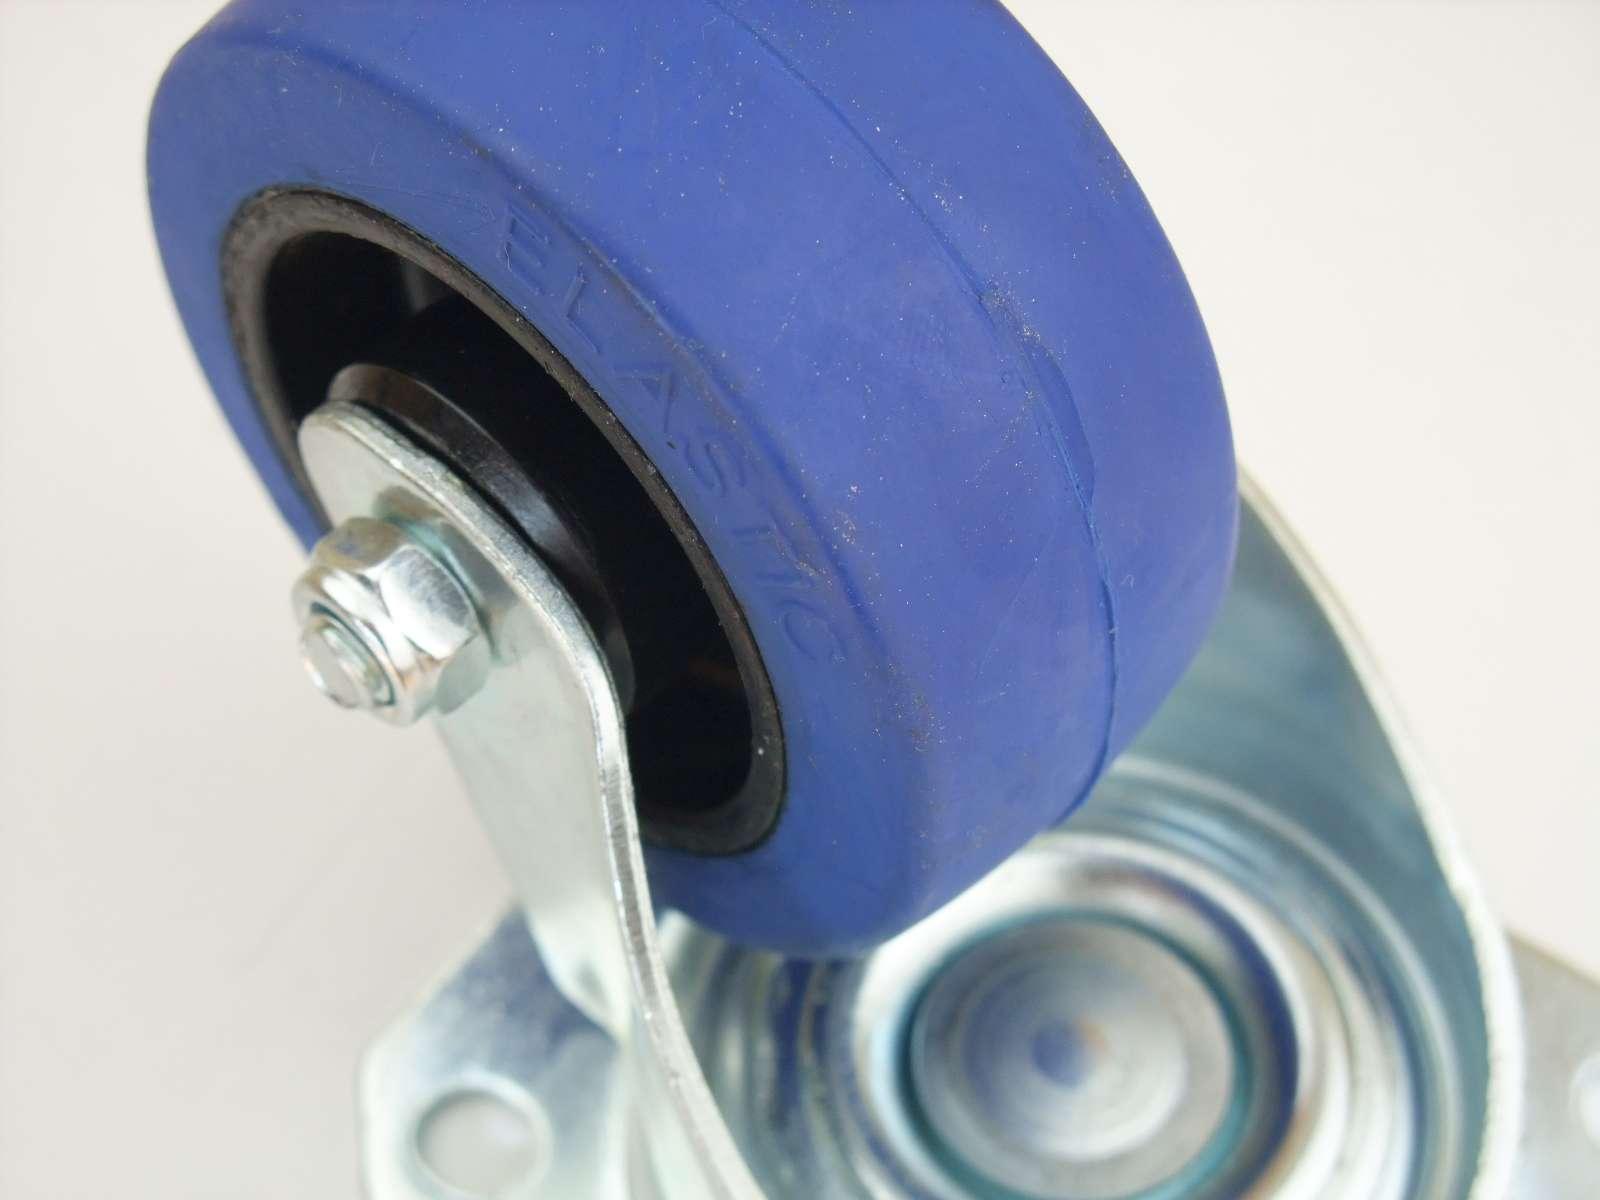 Pro-audio Equipment Rollen Mit Anschraubplatte 24 Sl 80 Mm Blue Wheel Rollen Lenkrollen Transportrollen Schwerlastrollen Wheels